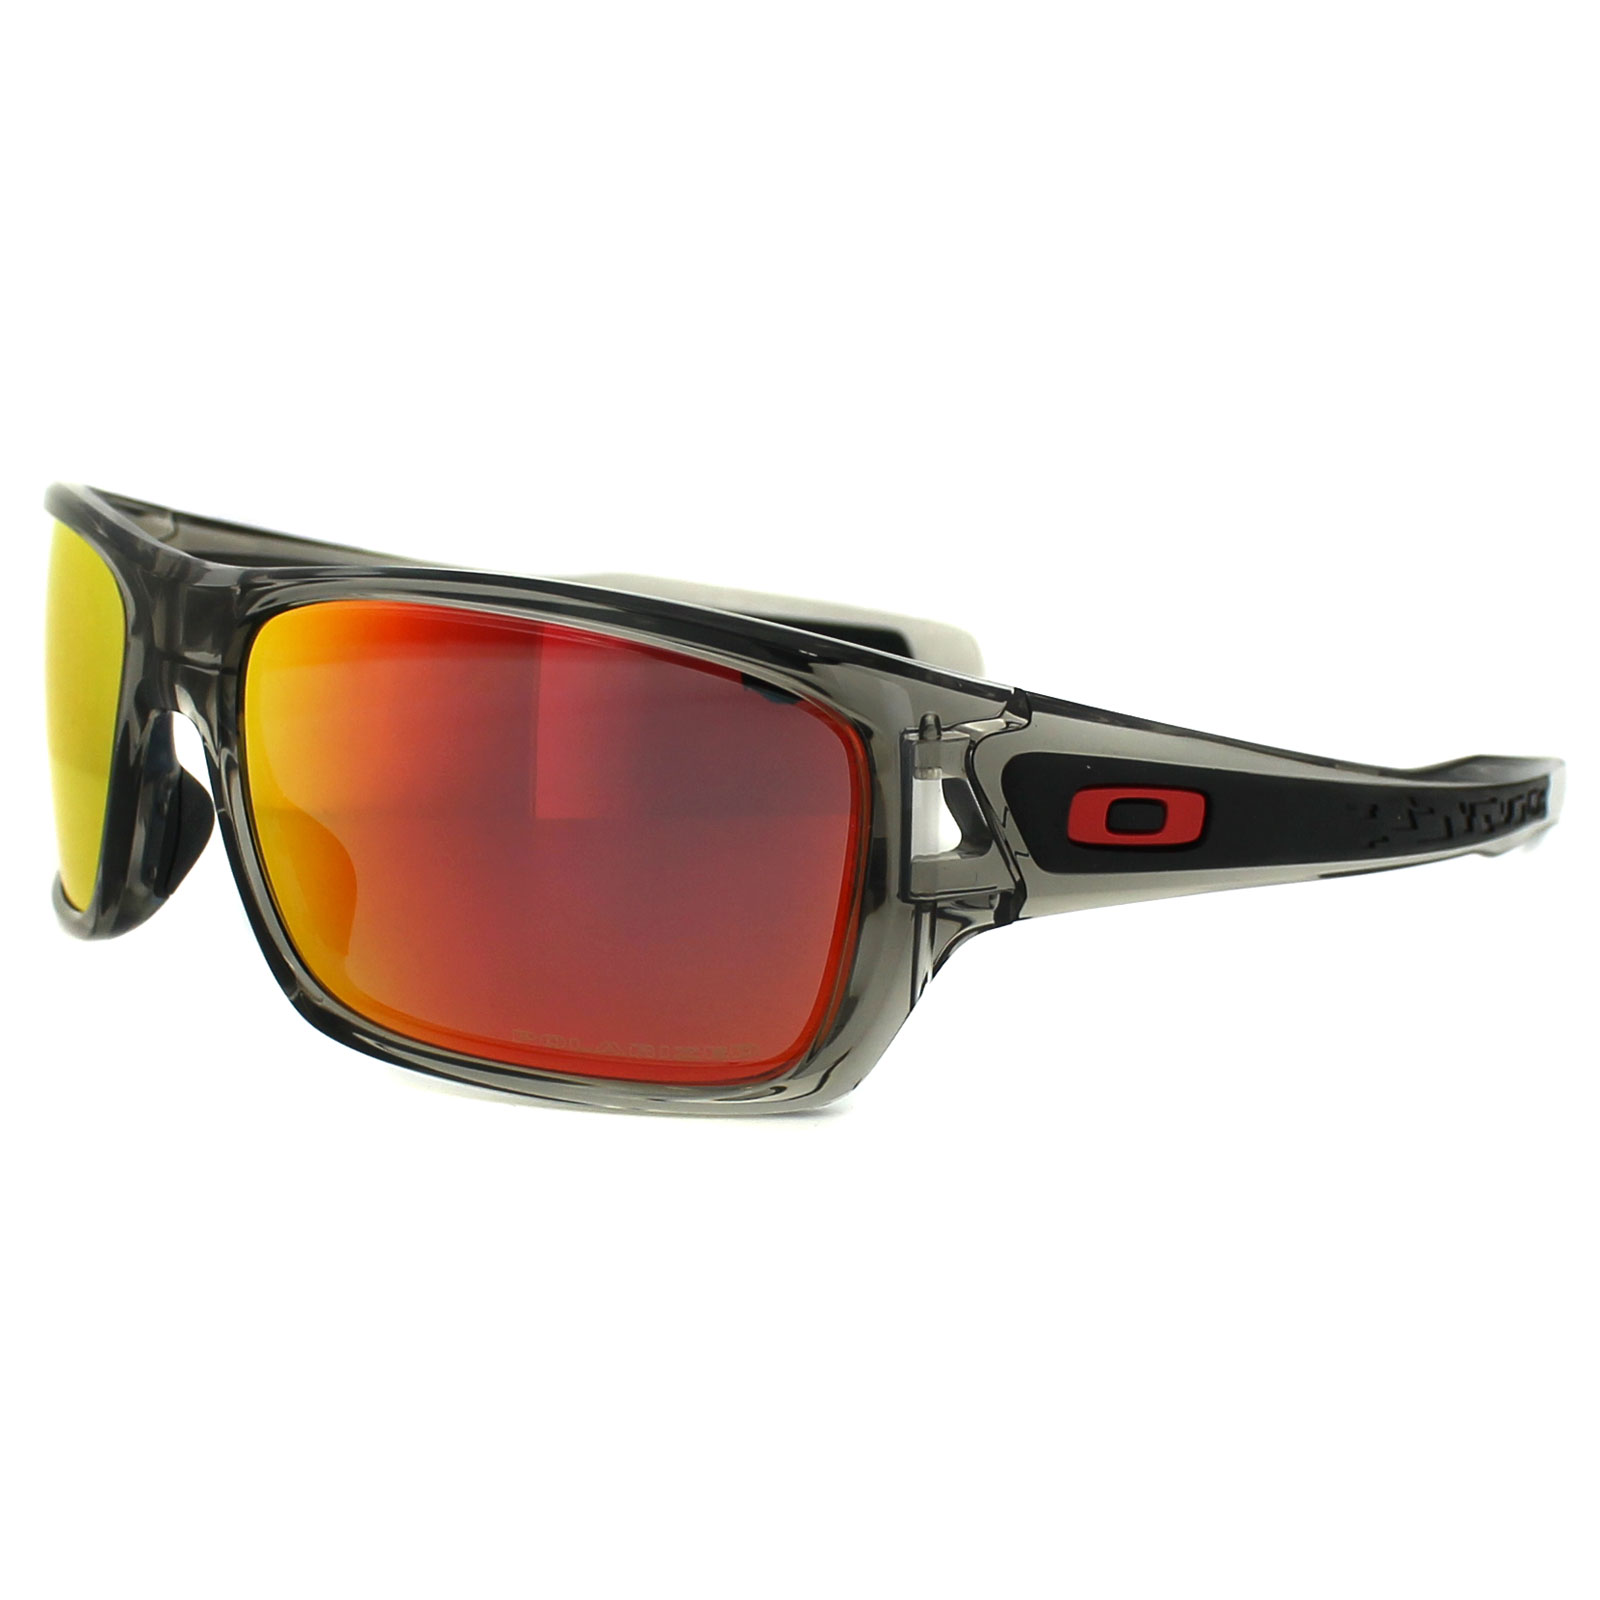 91a3b0d92d7 Sentinel Oakley Sunglasses Turbine OO9263-10 Grey Ink Ruby Iridium Polarized